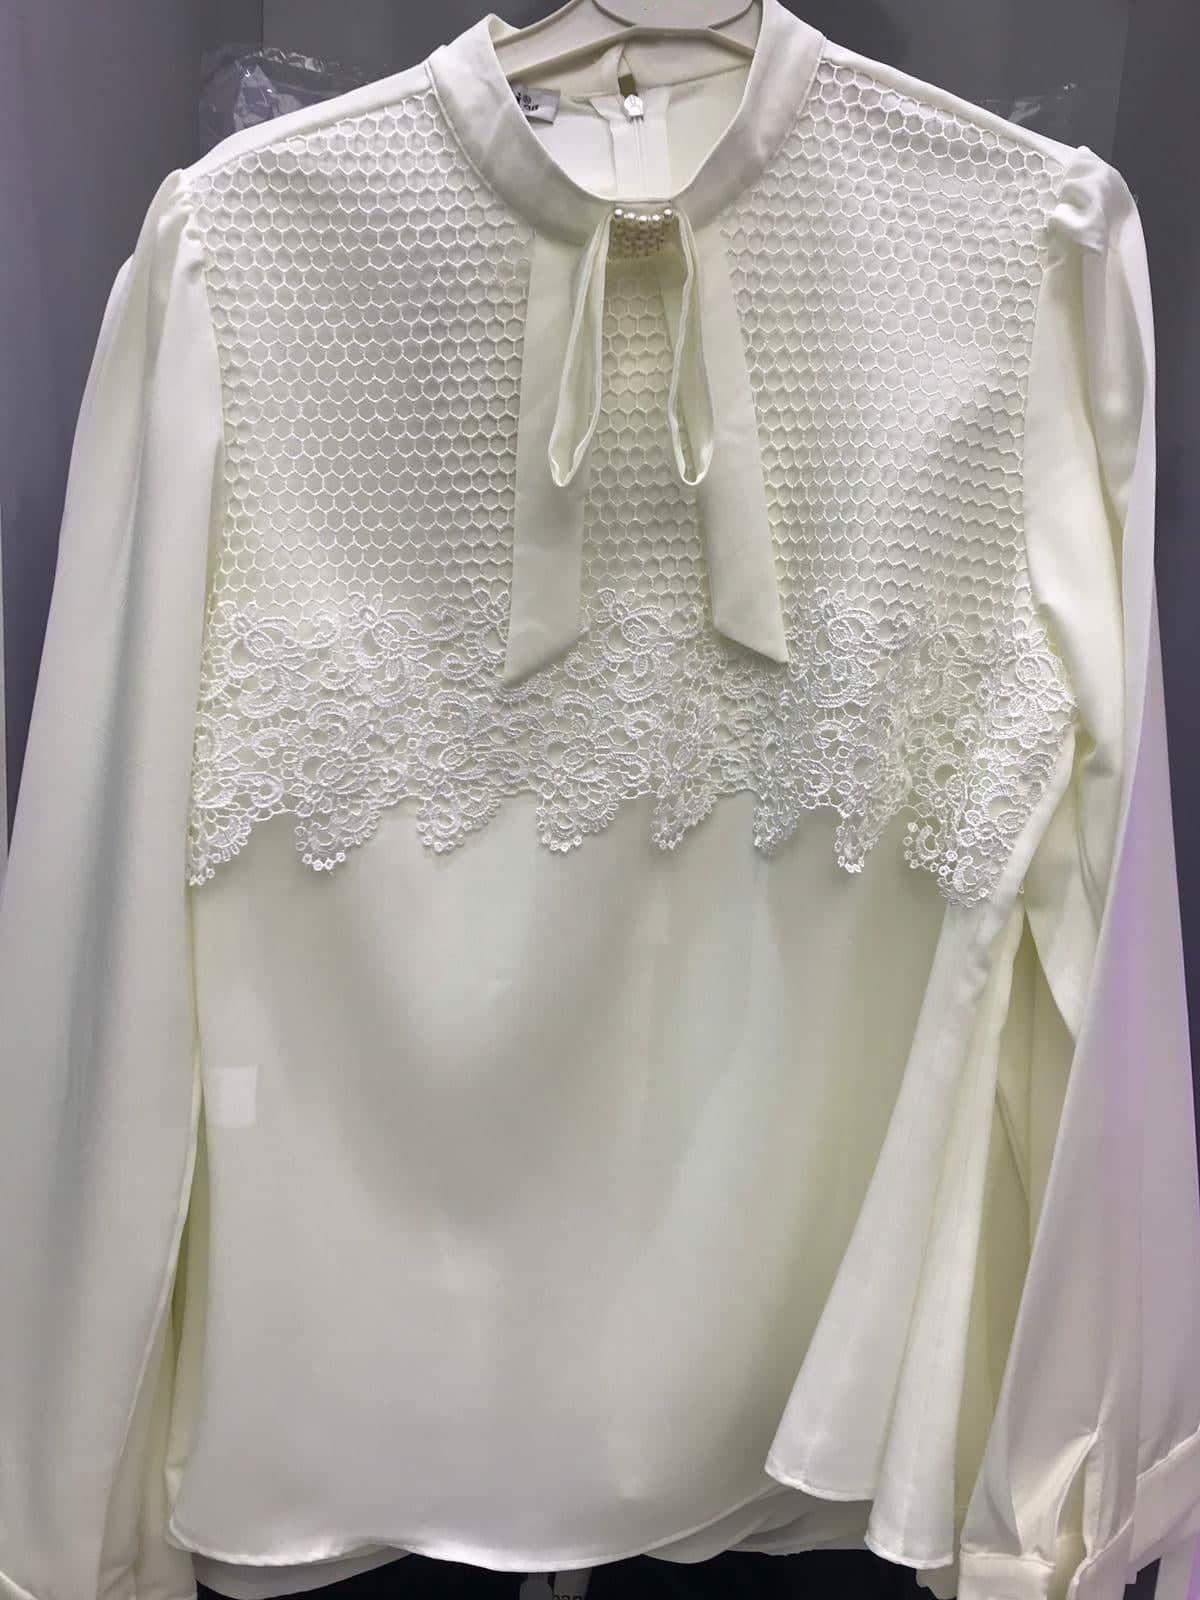 Whole Sale Optom Prodazha For Details 90 533 654 31 25 Whatsapp Russian English Bayan Ust Giyim Blouse Bluz Toptan Satis Ust Giyim Bluz Ust